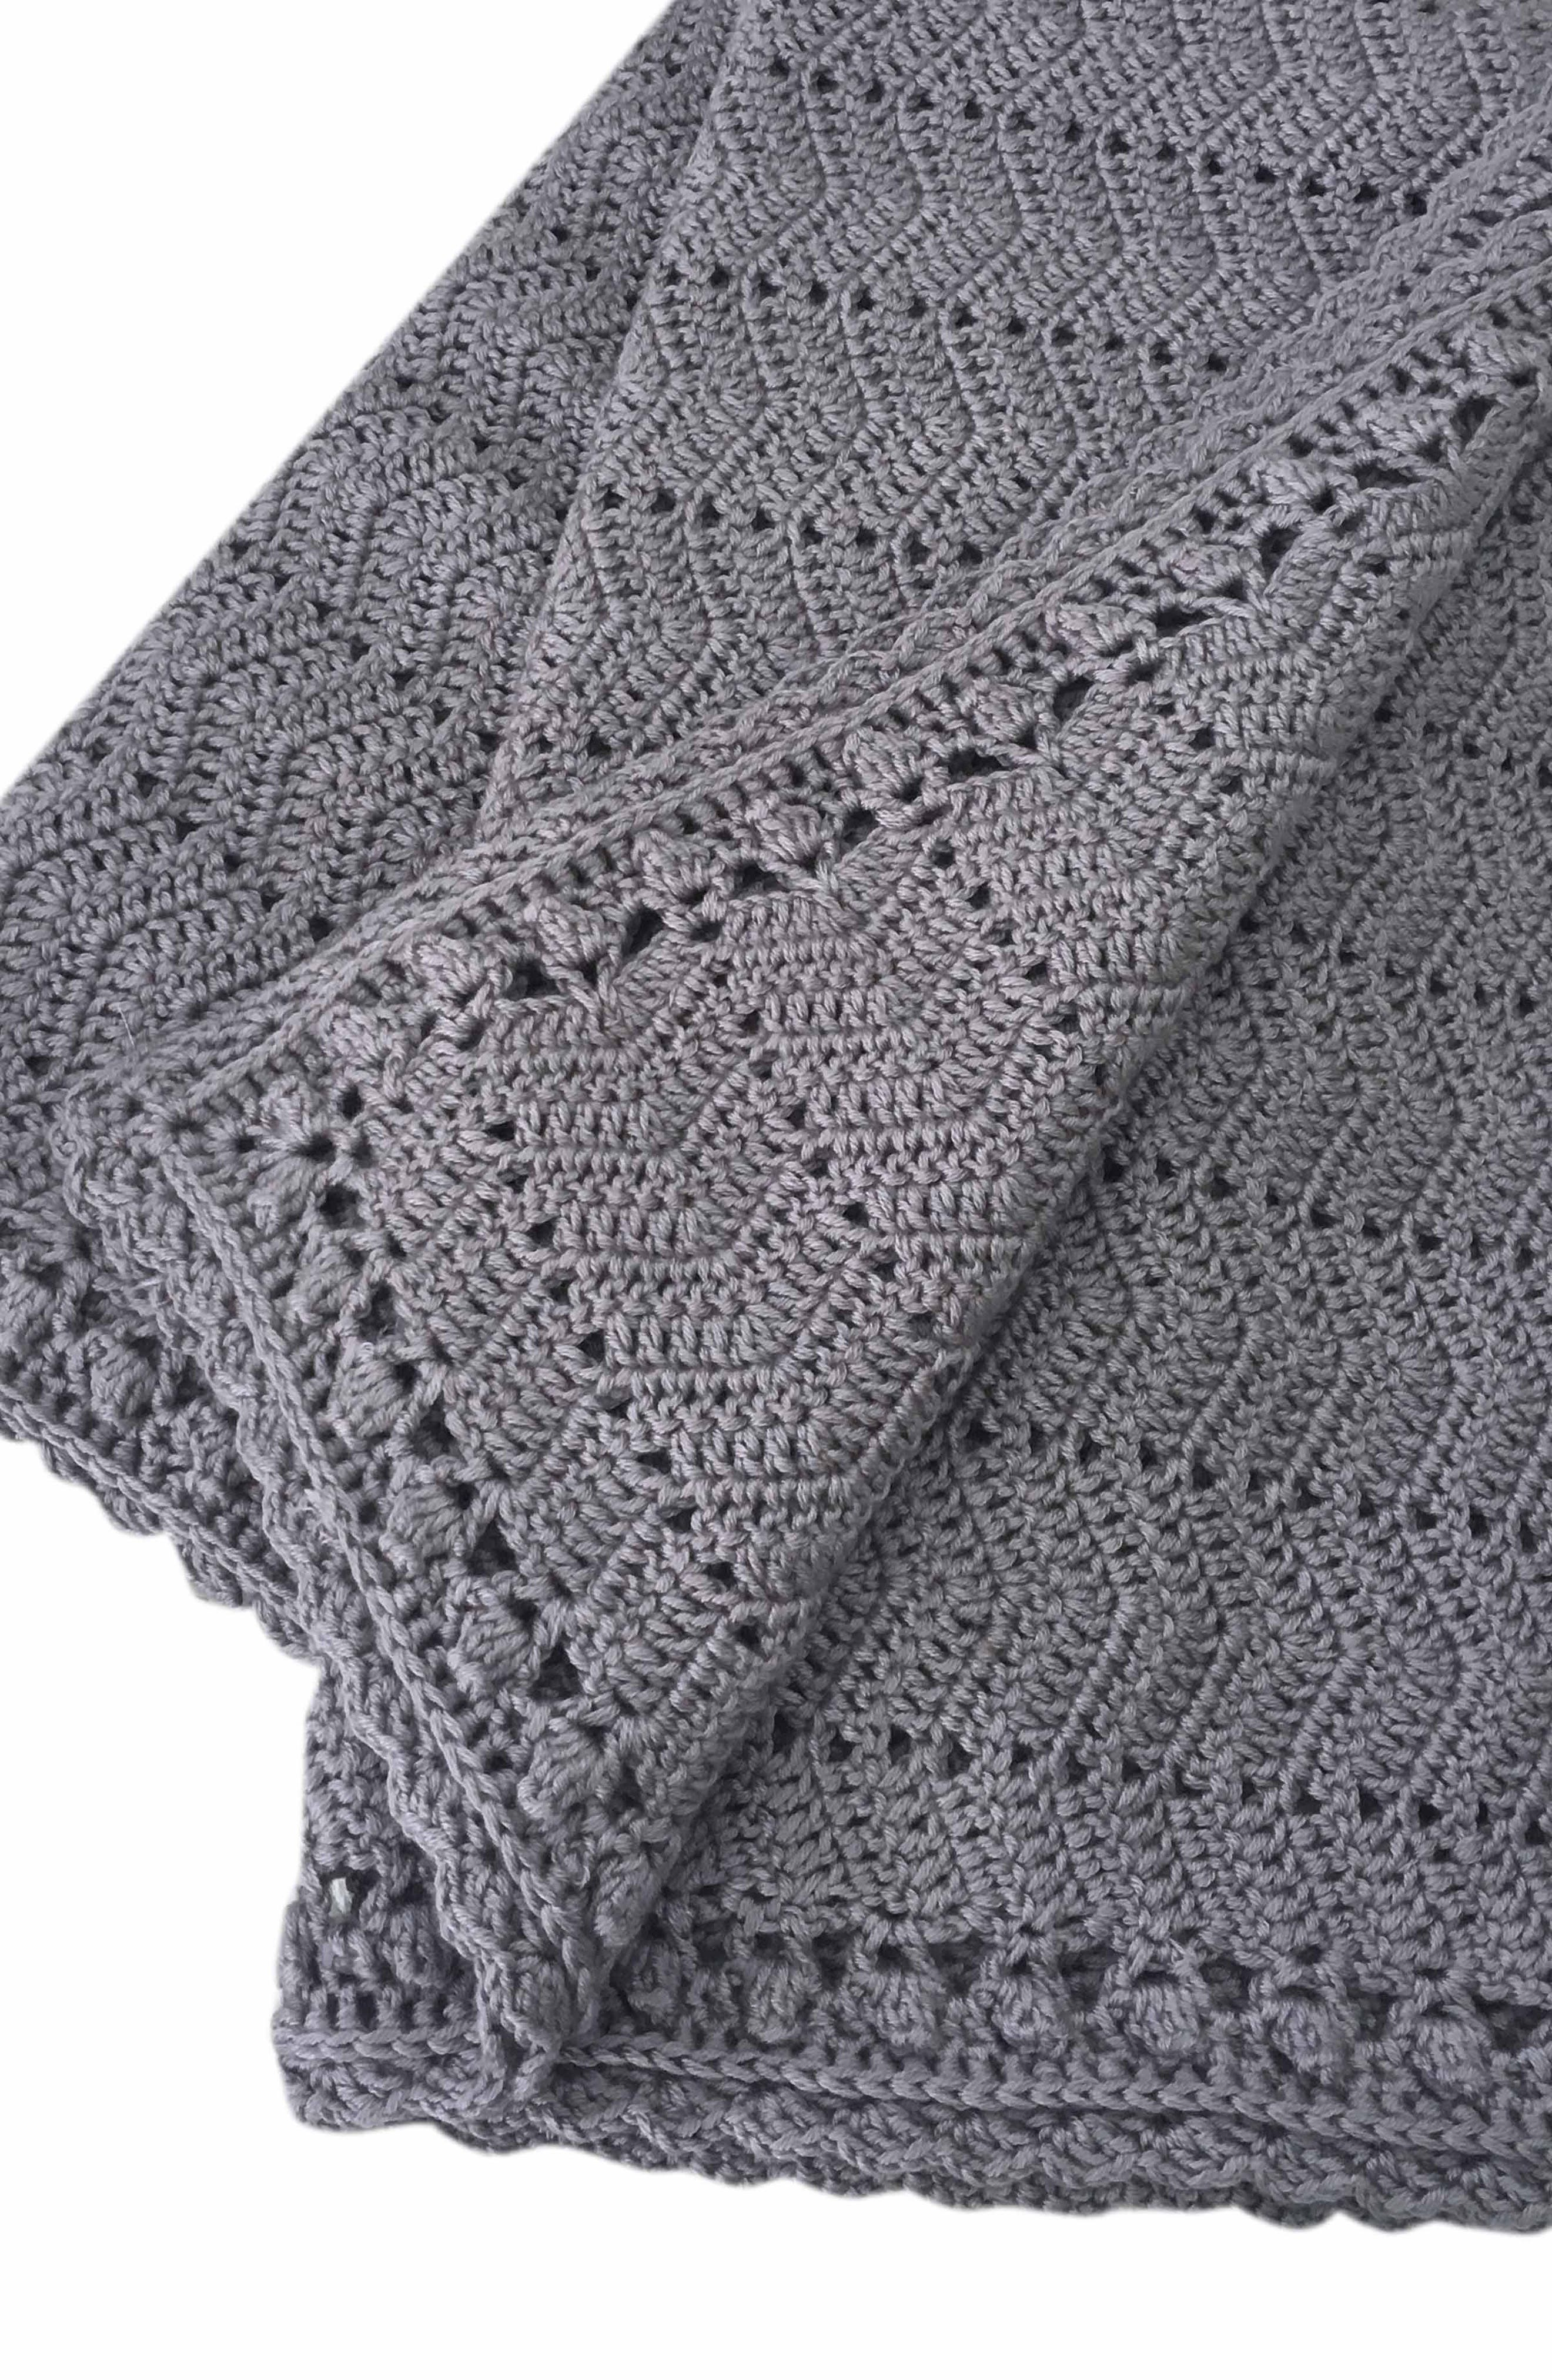 Ripple Crocheted Blanket,                         Main,                         color, 020